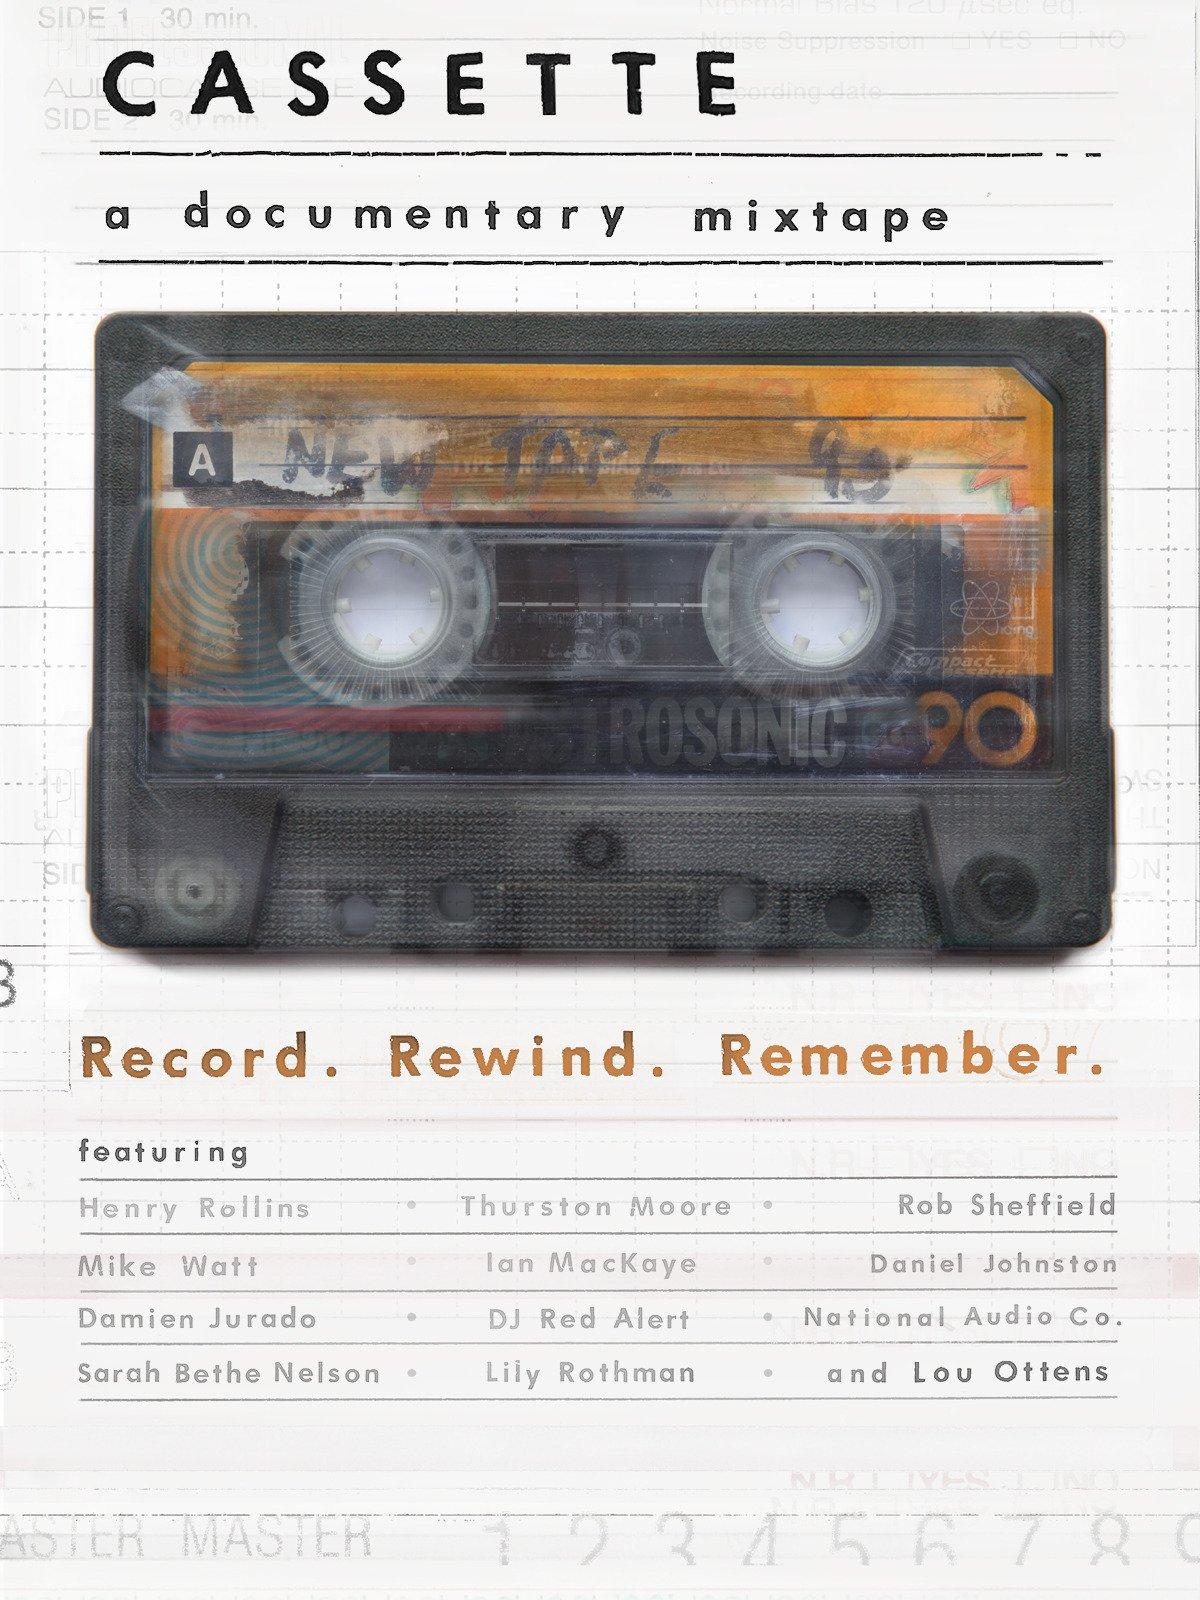 Cassette: A Documentary Mixtape on Amazon Prime Video UK